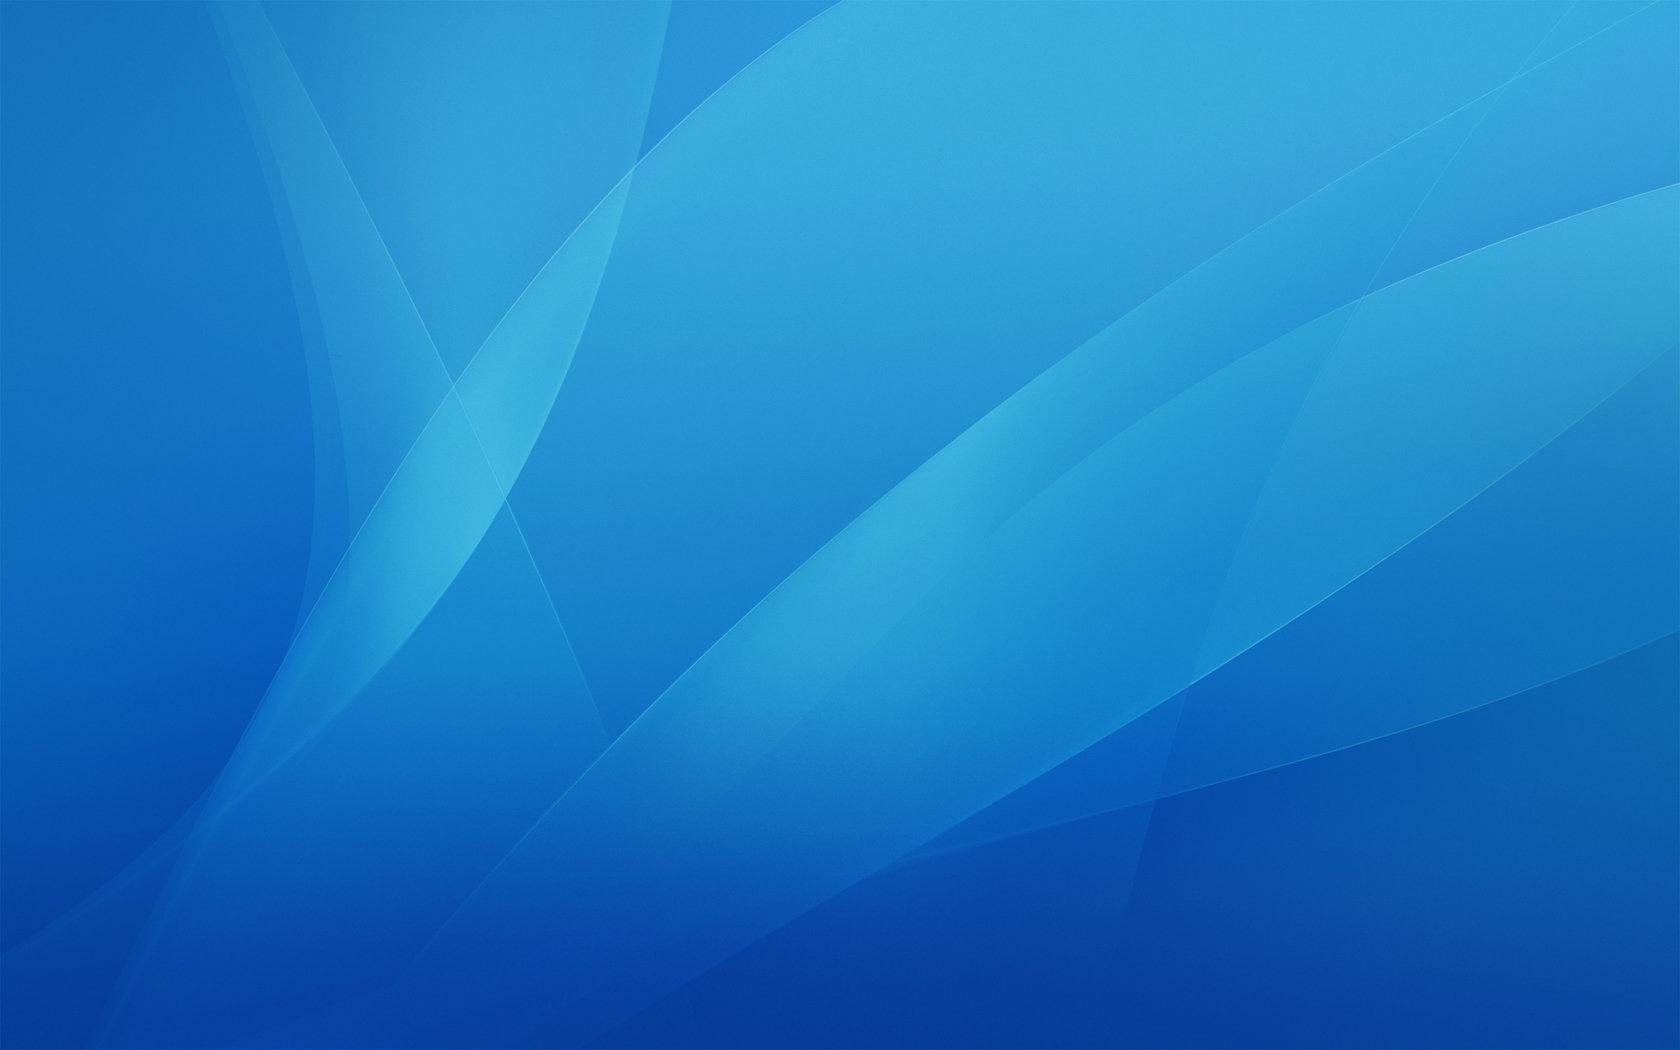 Tiger Wallpaper Light Blue by Dedone 1680x1050